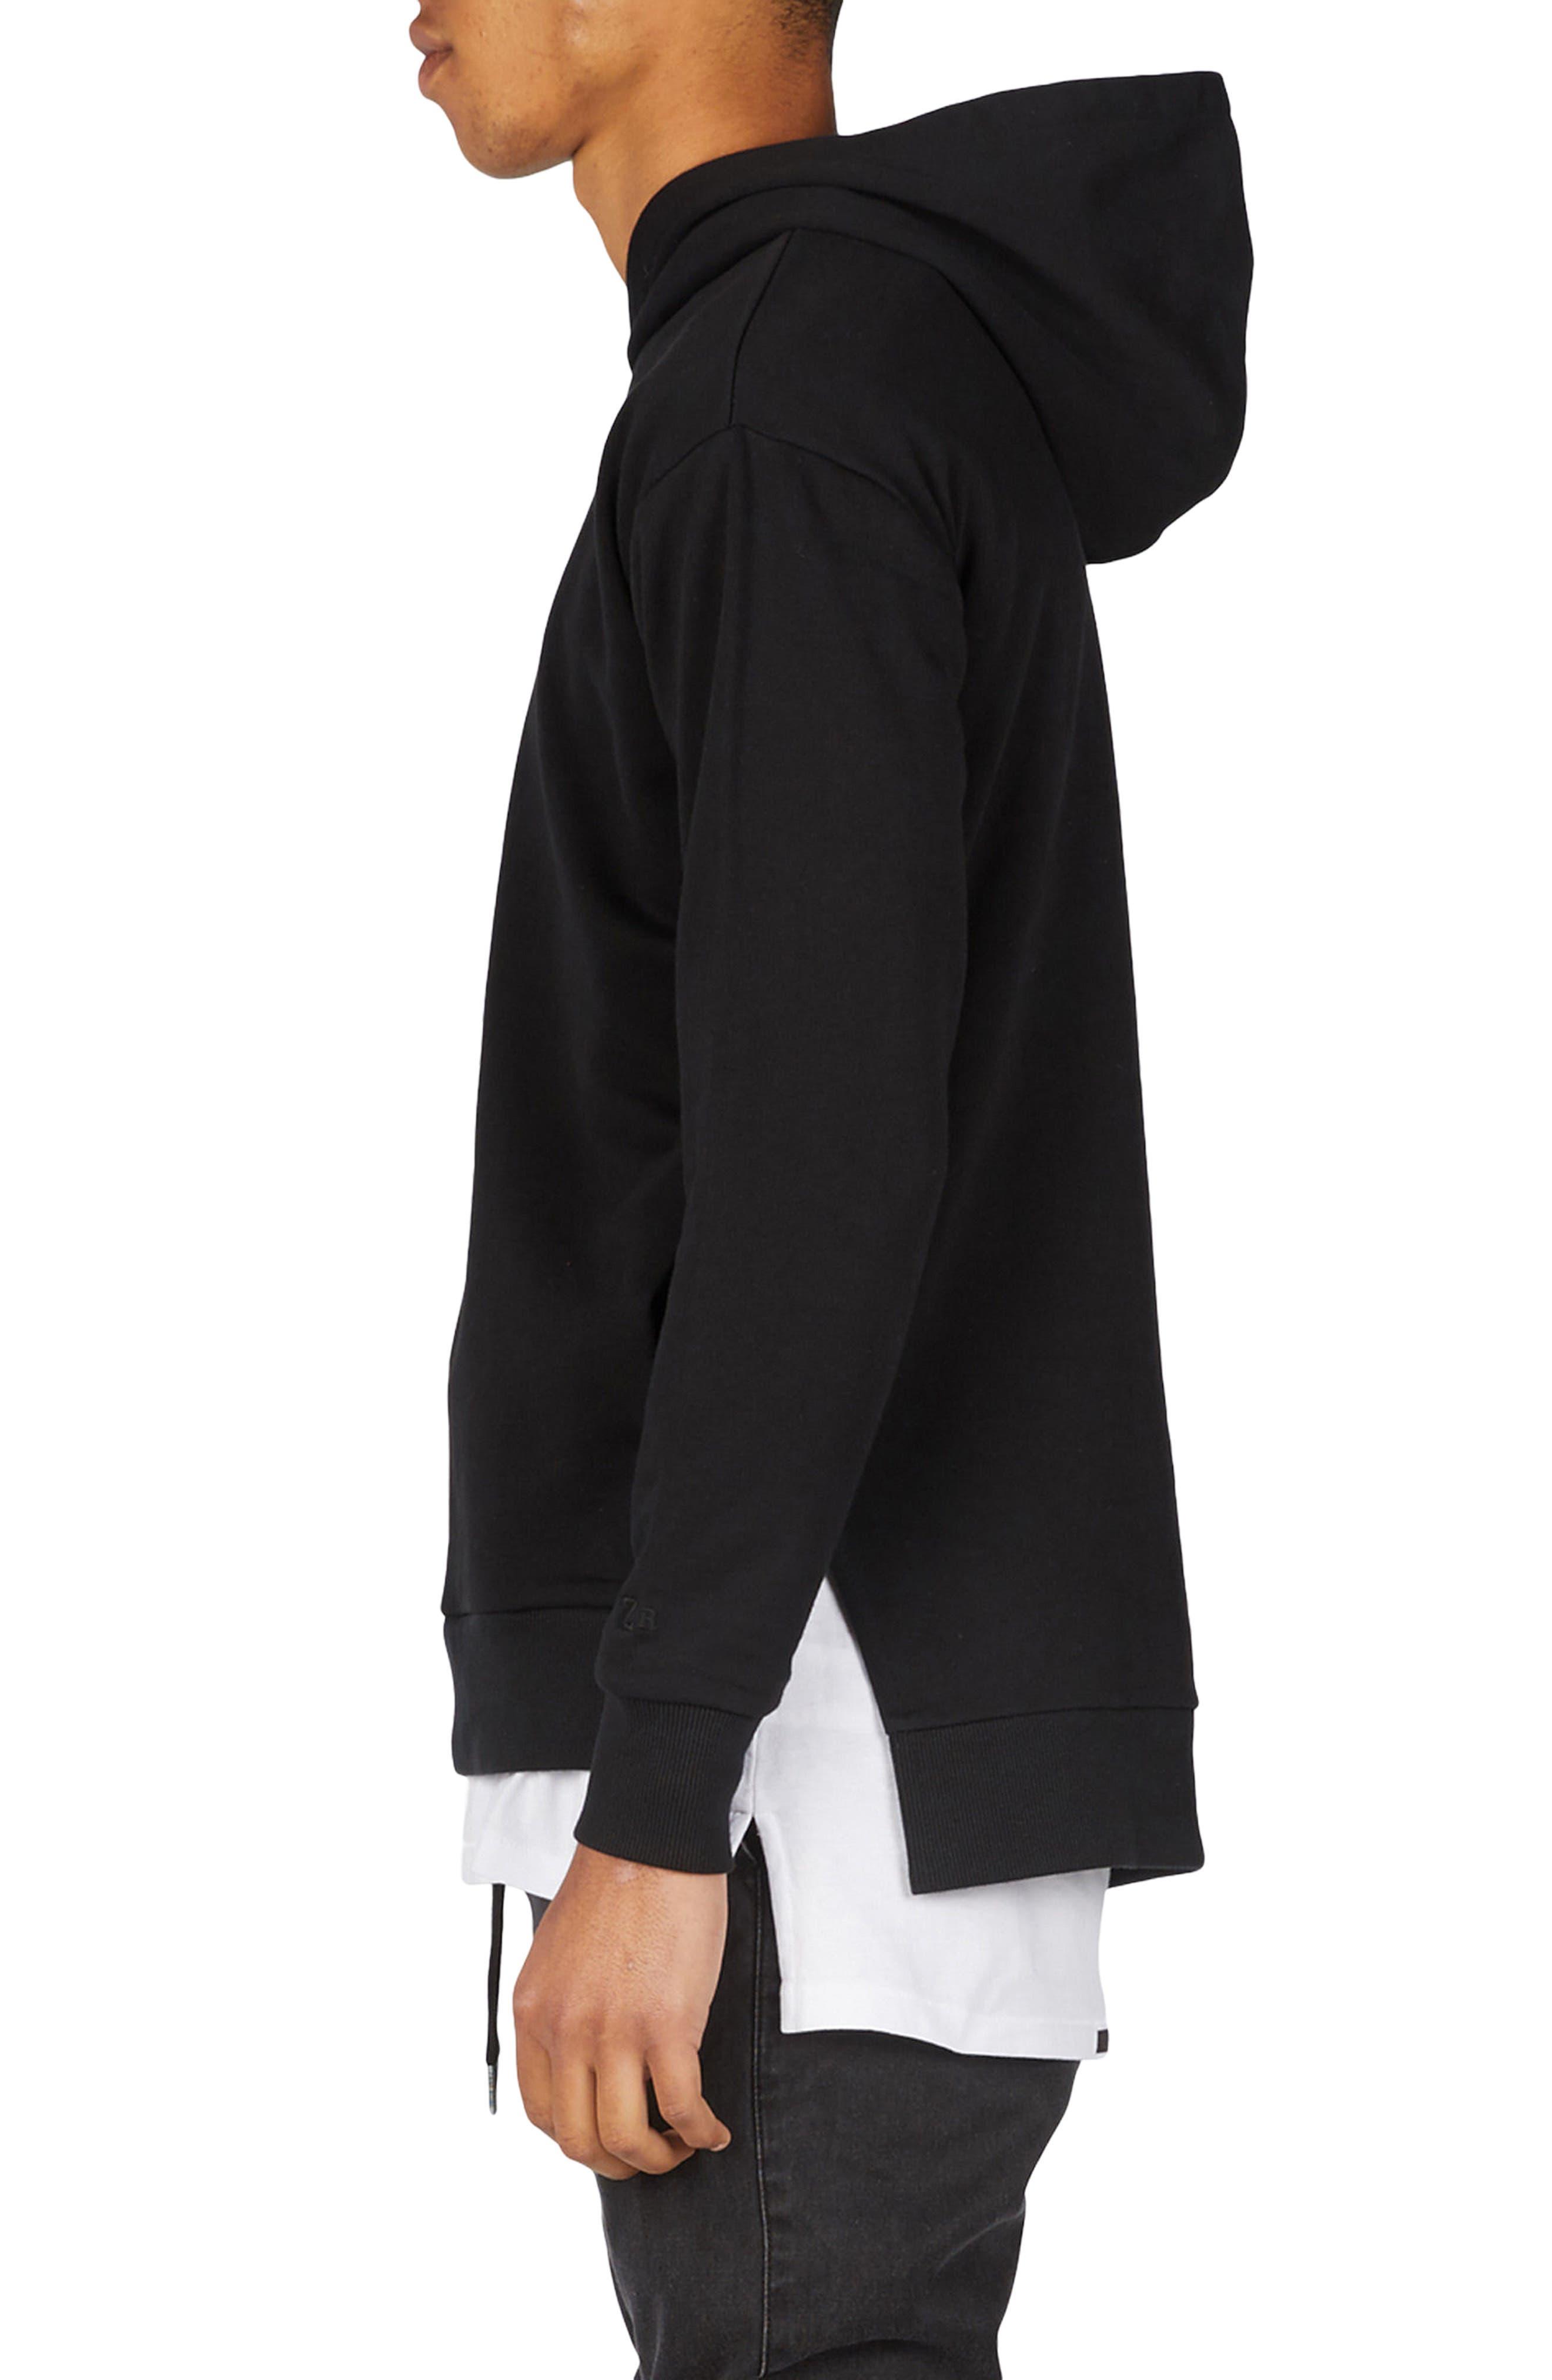 Season Rugger Hooded Sweatshirt,                             Alternate thumbnail 3, color,                             Black